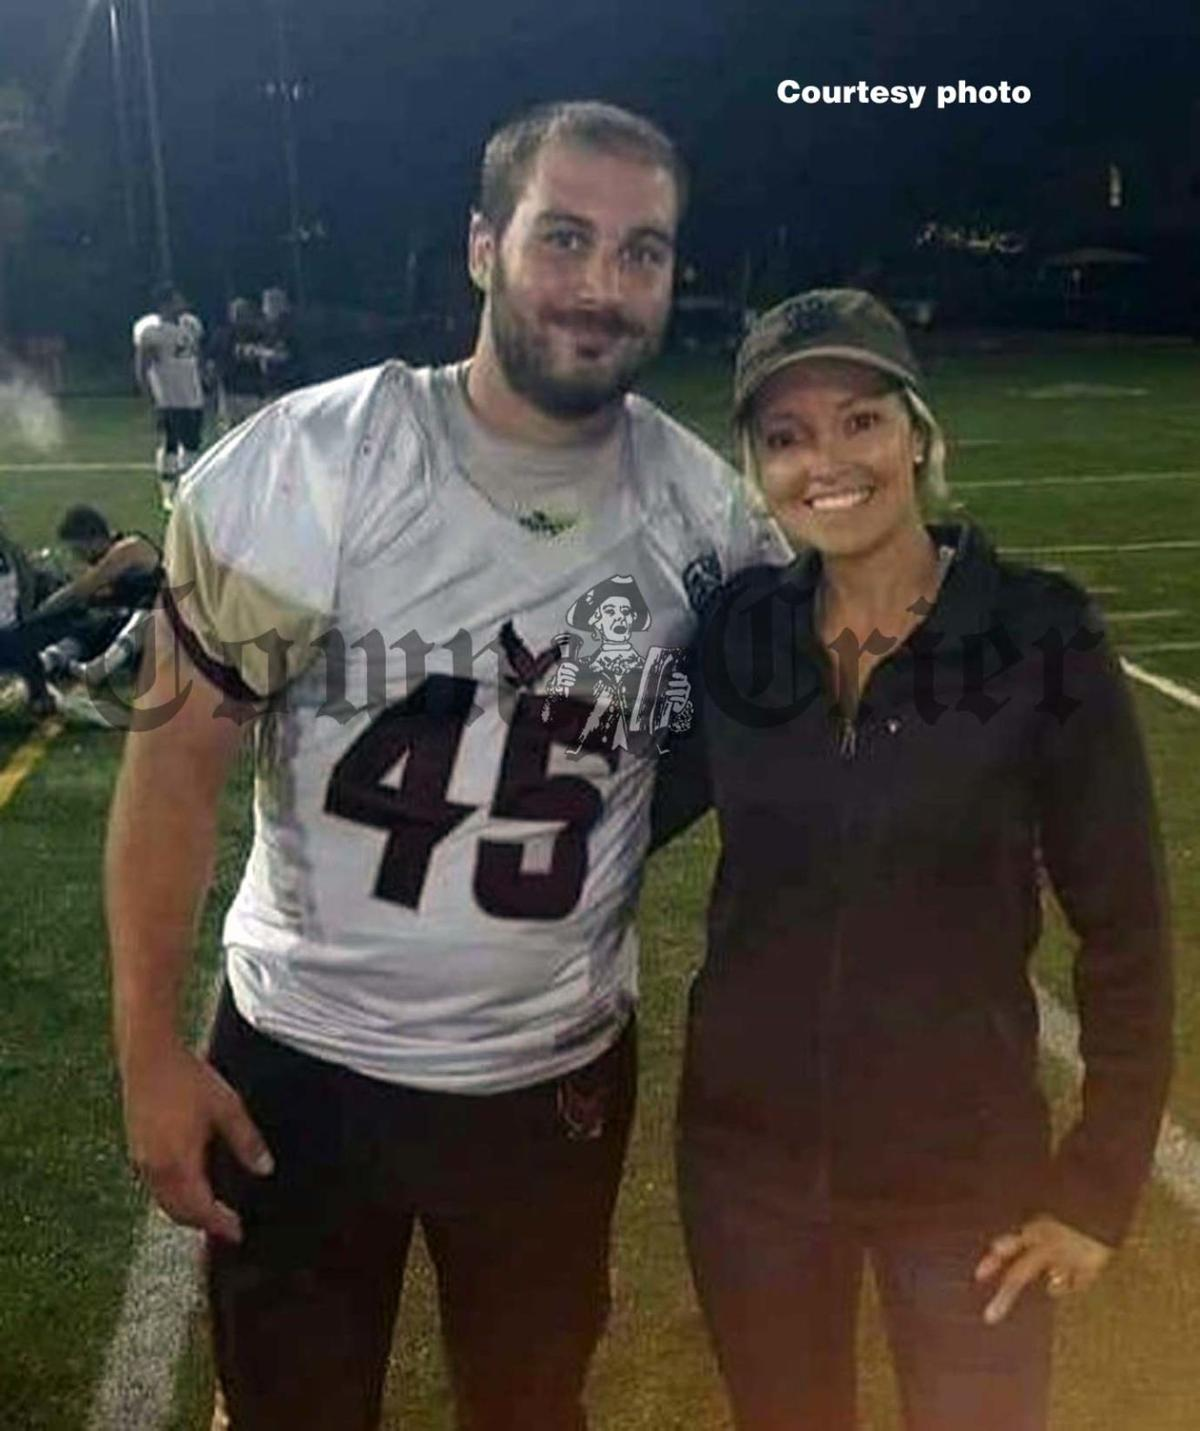 Wilmington resident Zachary Swale with fiancee